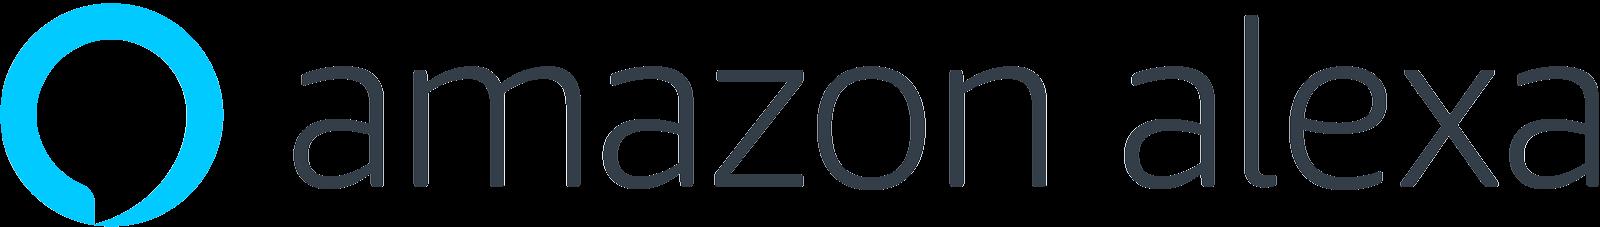 Amazon alexa horizontal